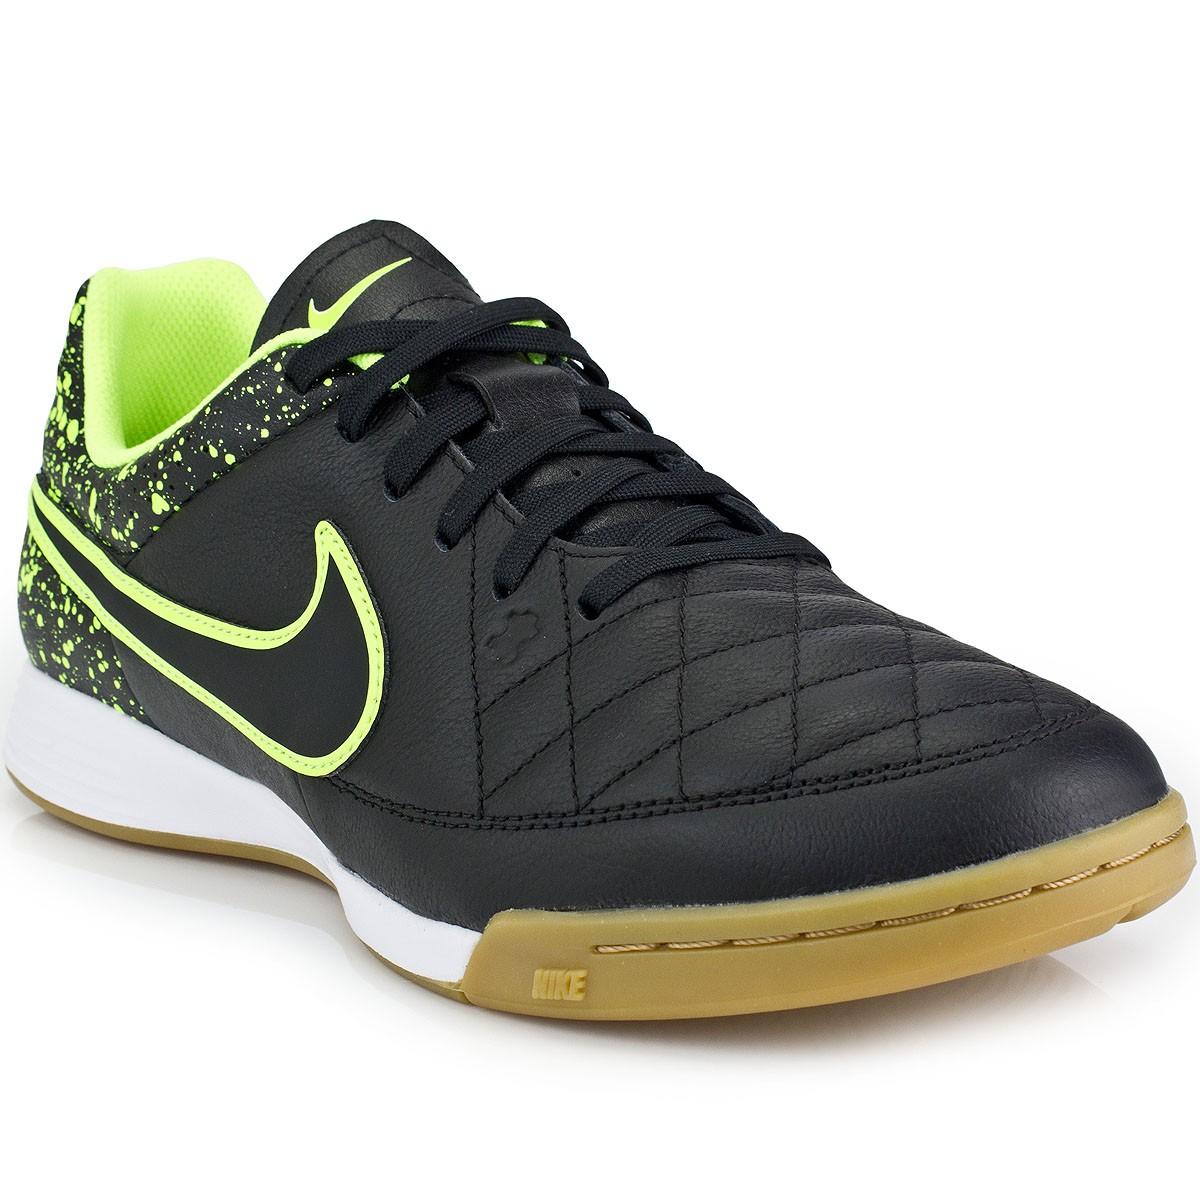 Chuteira Nike Tiempo Genio Leather IC  5e607031e3d22